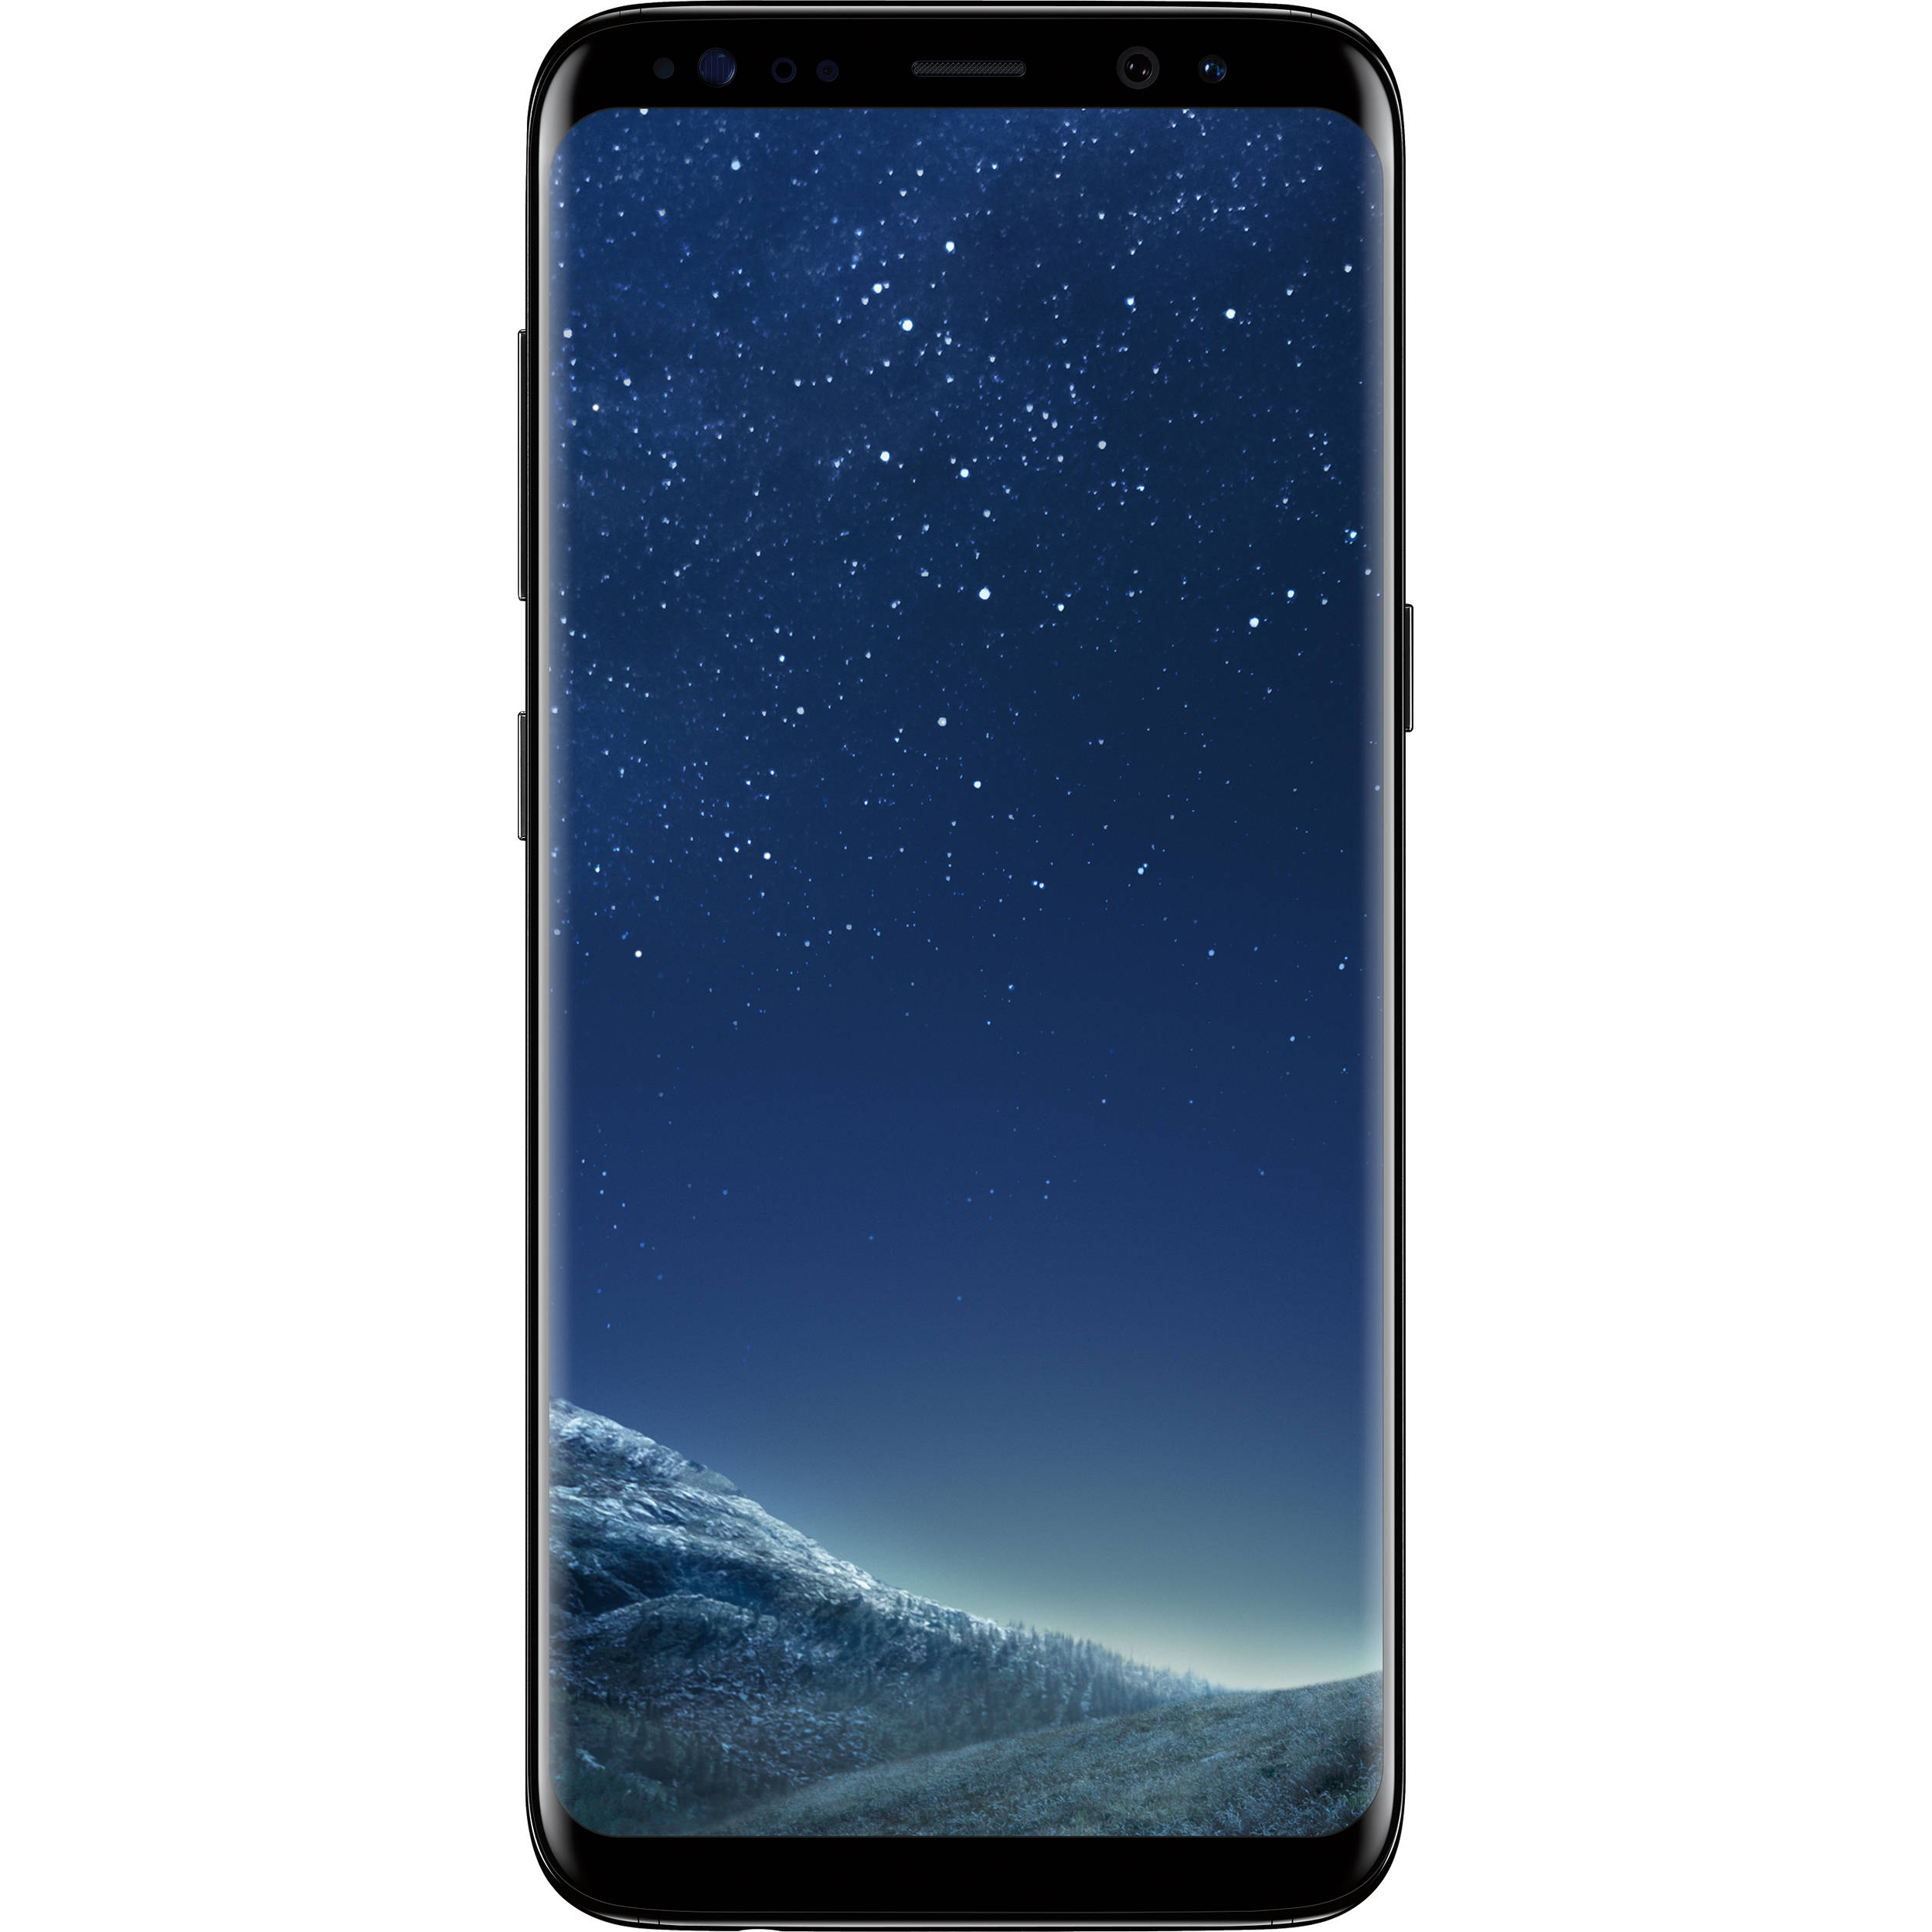 Samsung Galaxy S8 SM-G950U 64GB Smartphone SM-G950UZKAXAA B&H